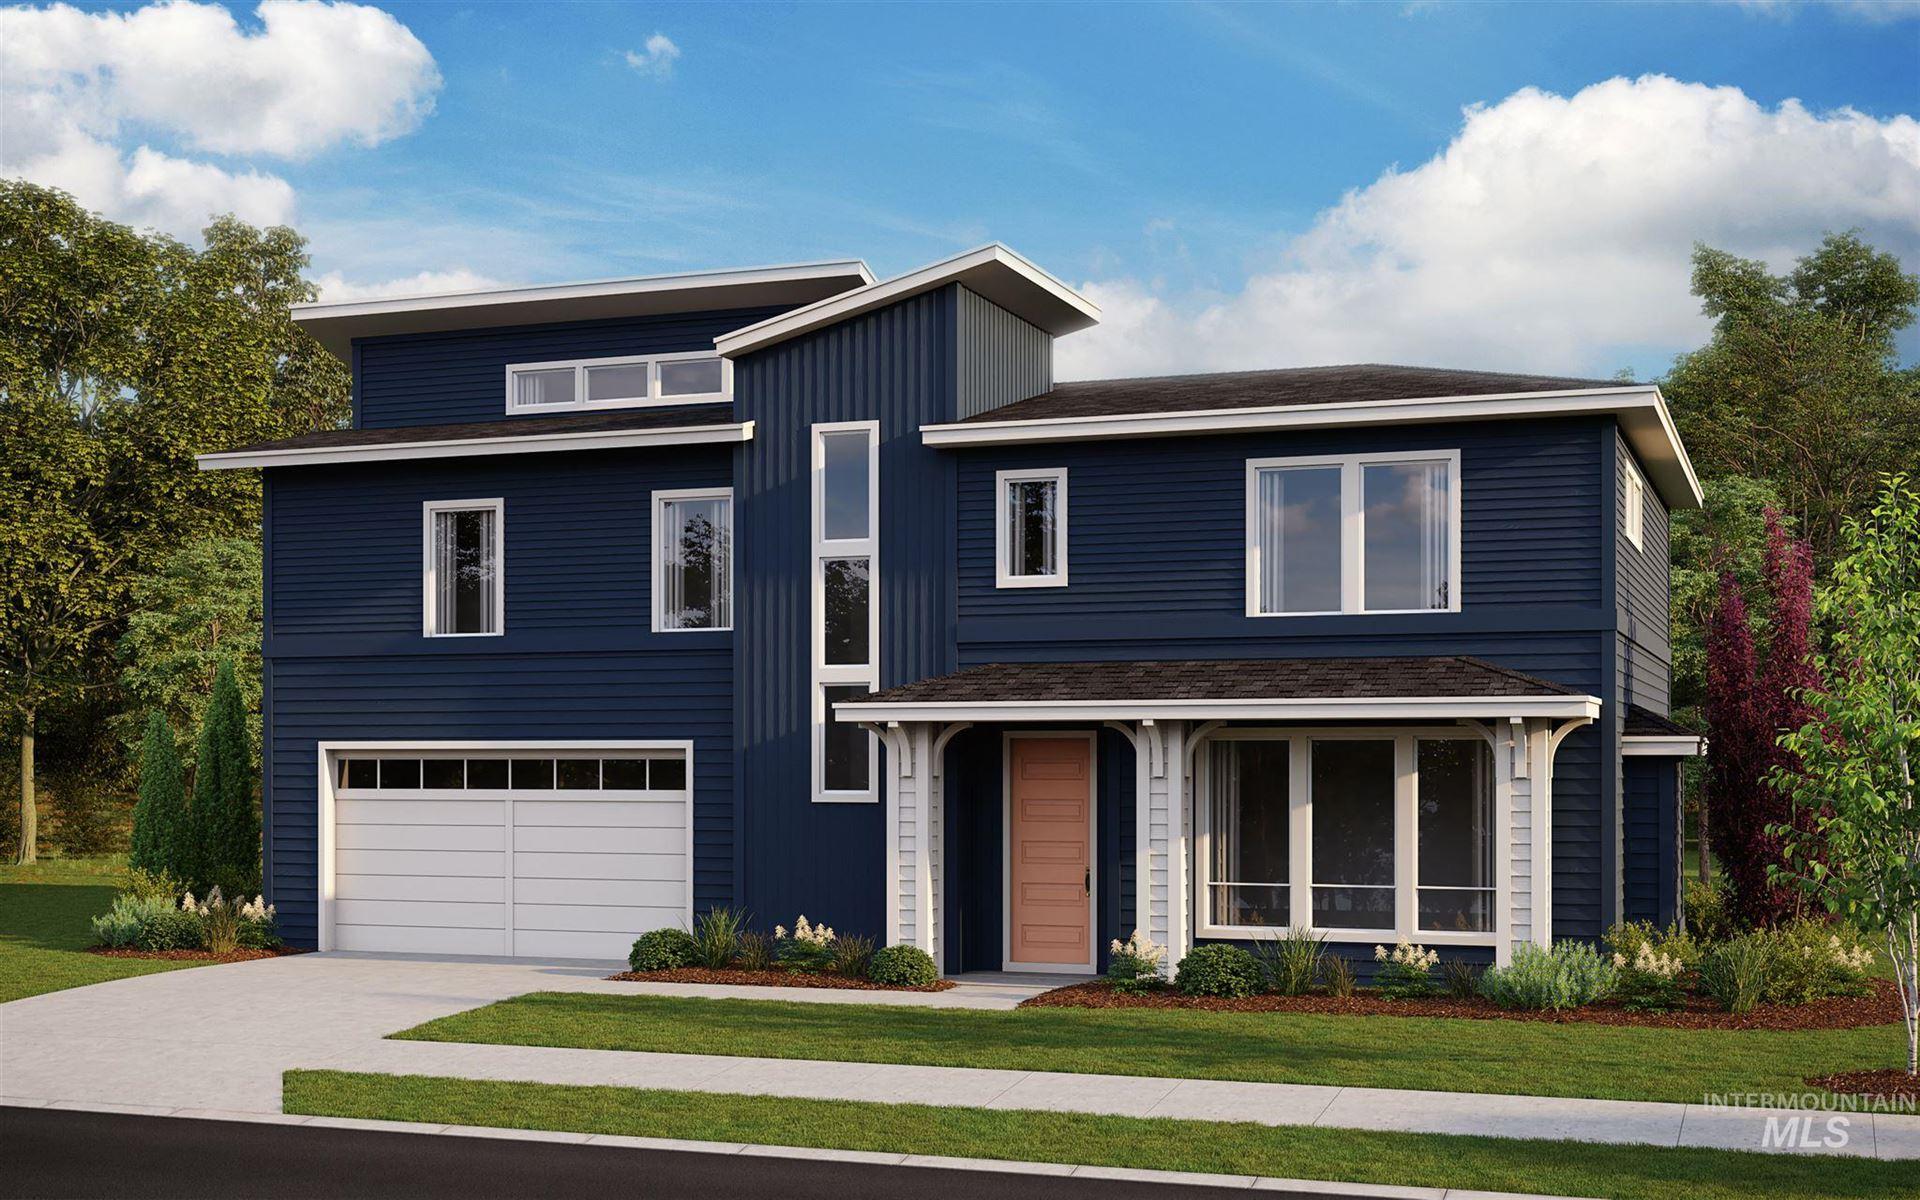 Lot 2 Blk 1 W Cyrus Street, Boise, ID 83705 - MLS#: 98767335